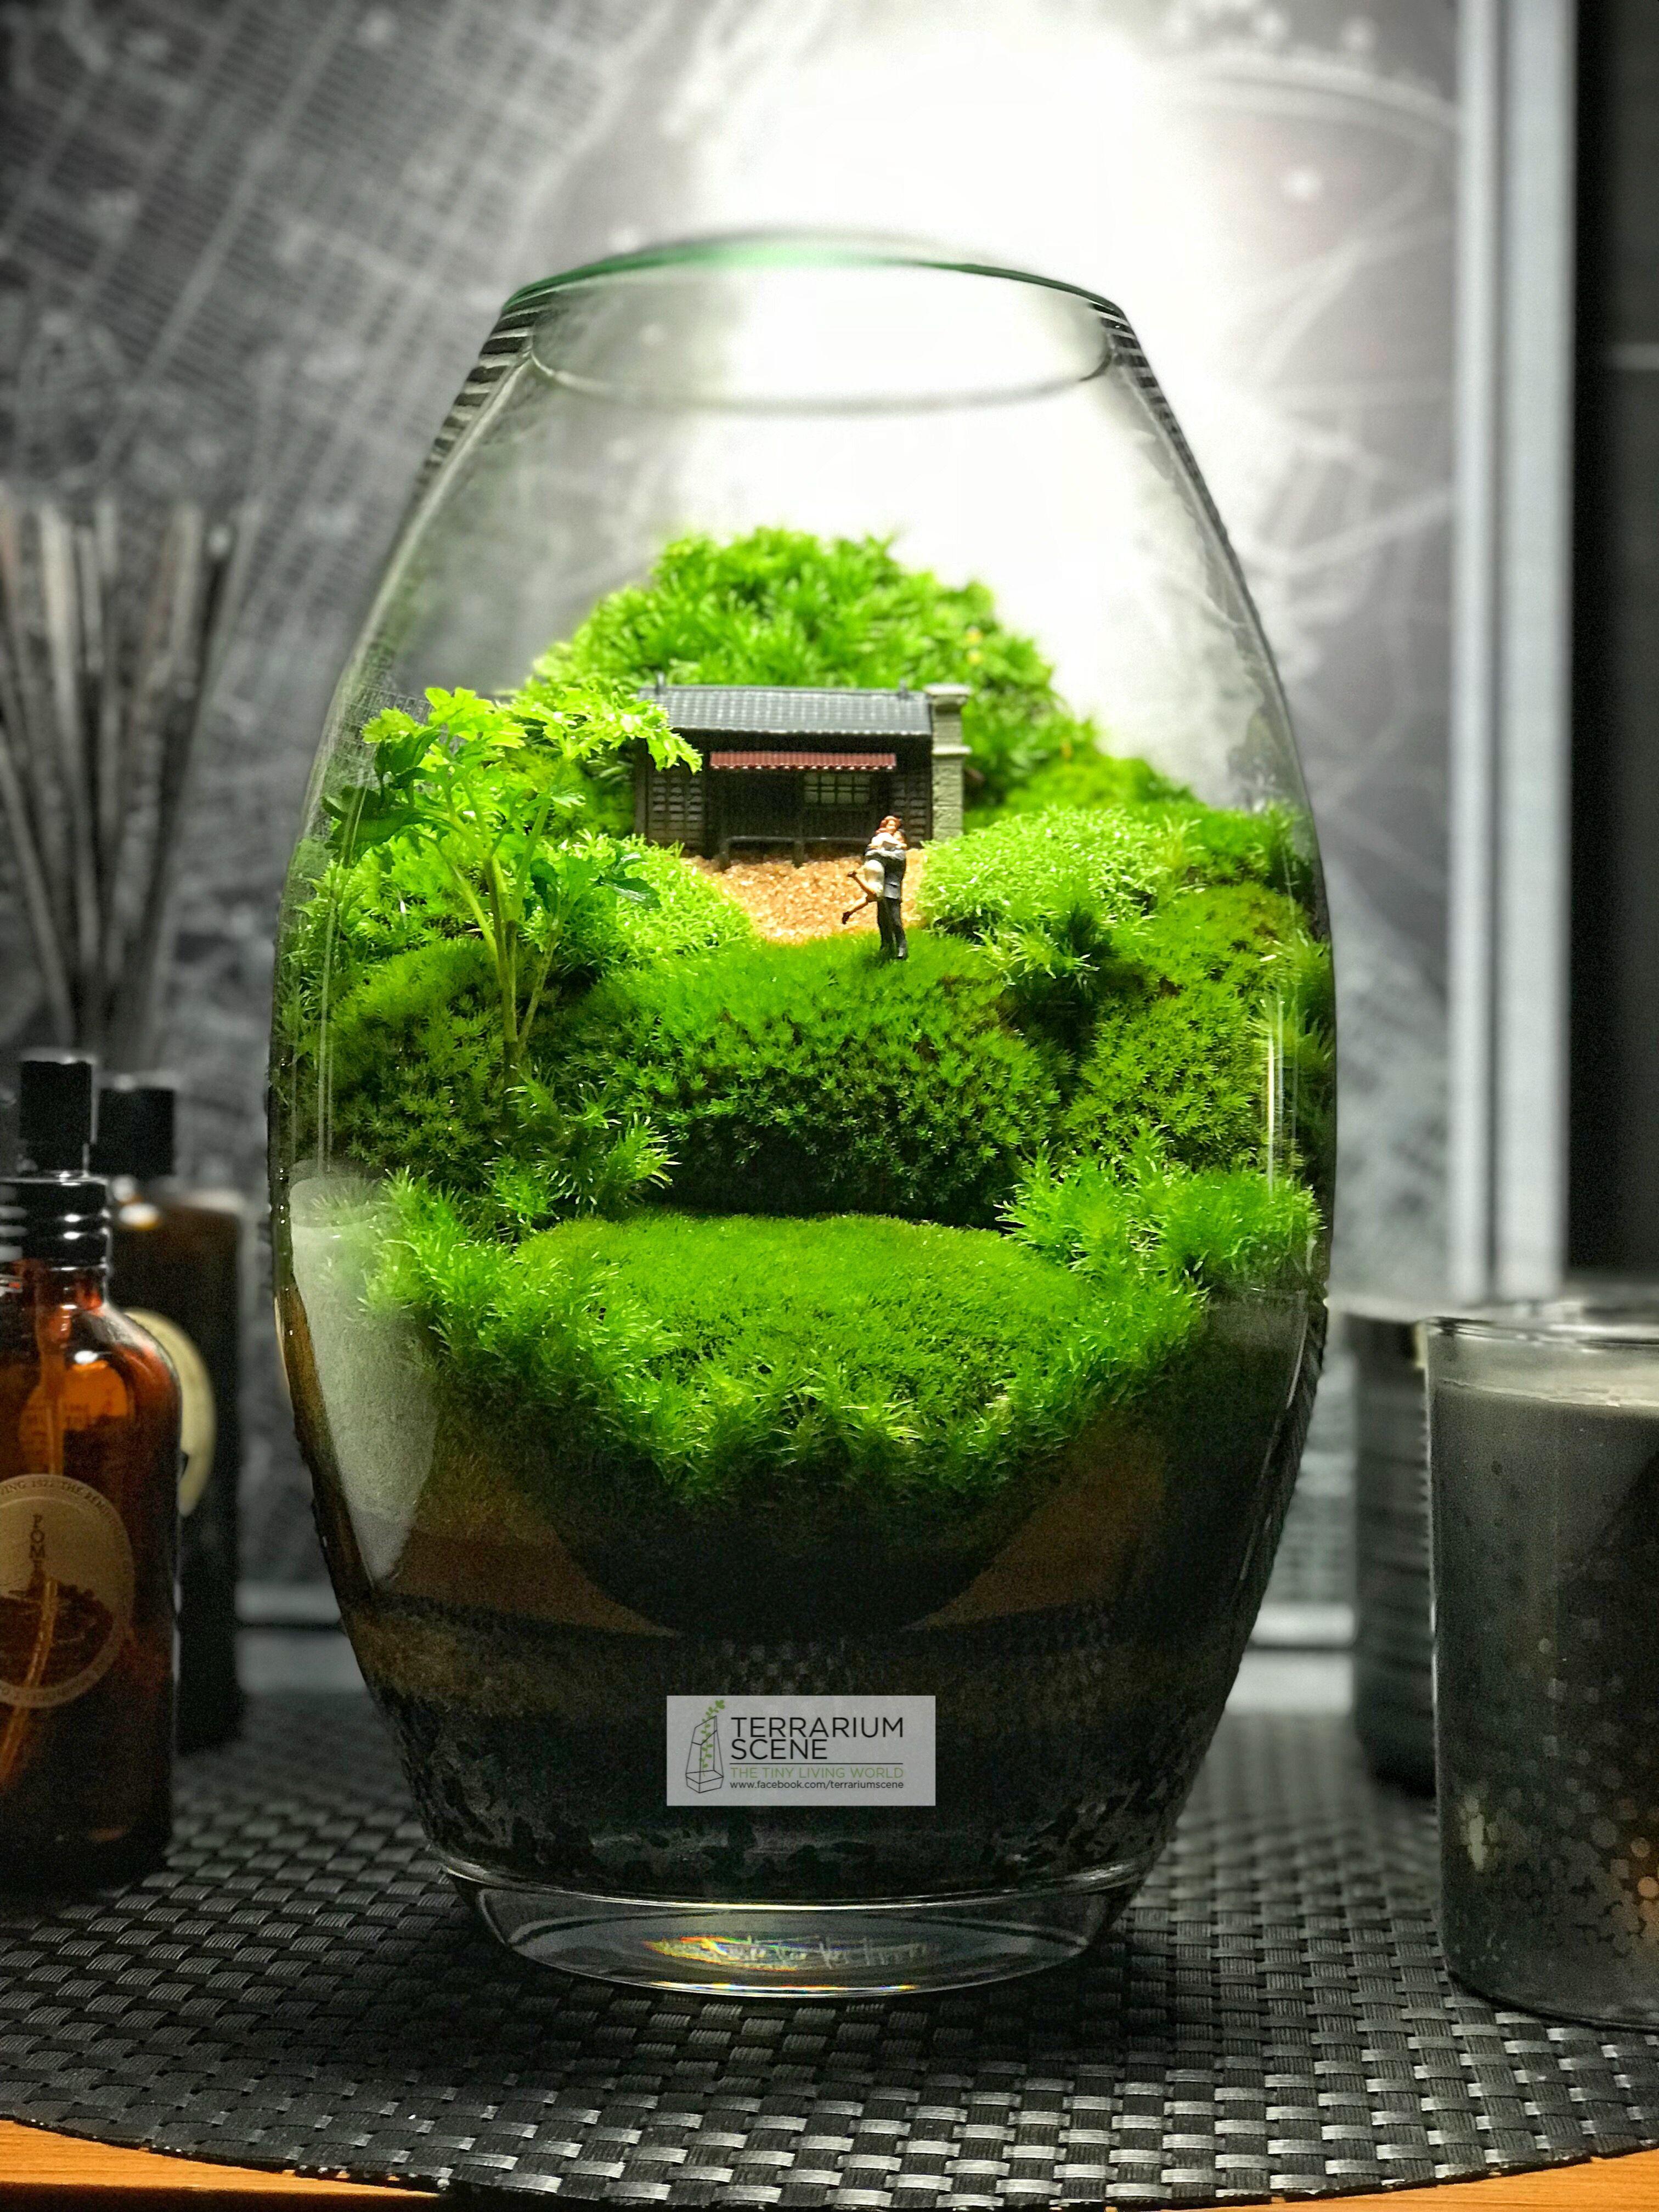 Pin By Terrariumscene On Moss Gardens Terrarium Jar Terrarium